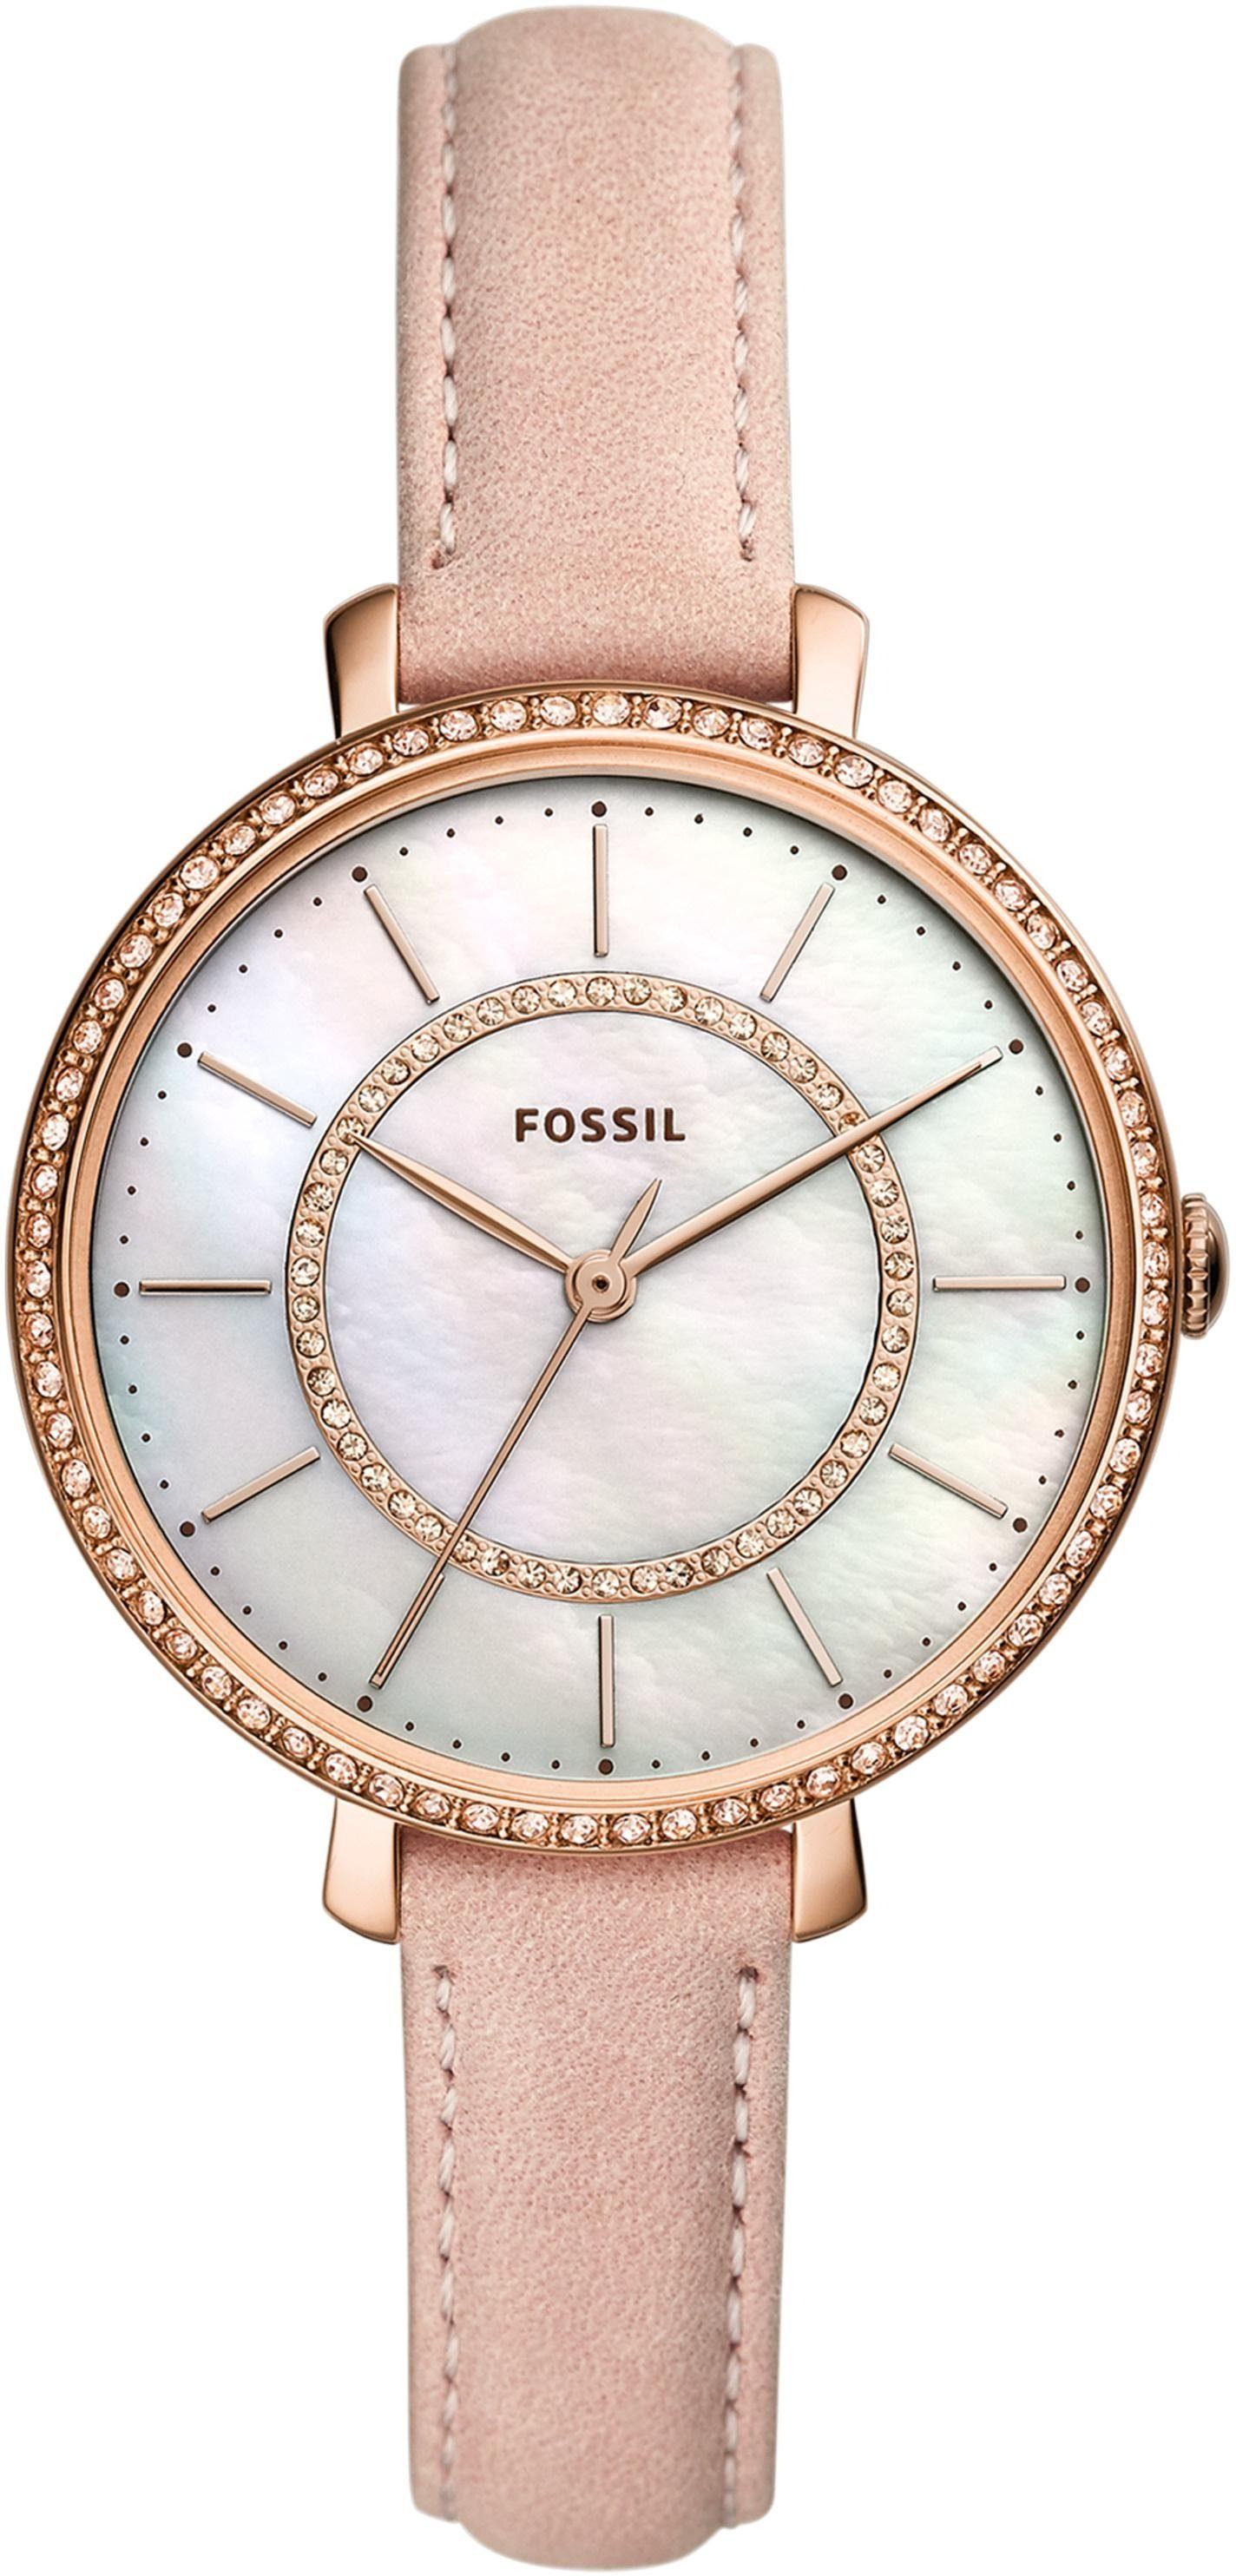 Fossil Quarzuhr »JOCELYN, ES4455«